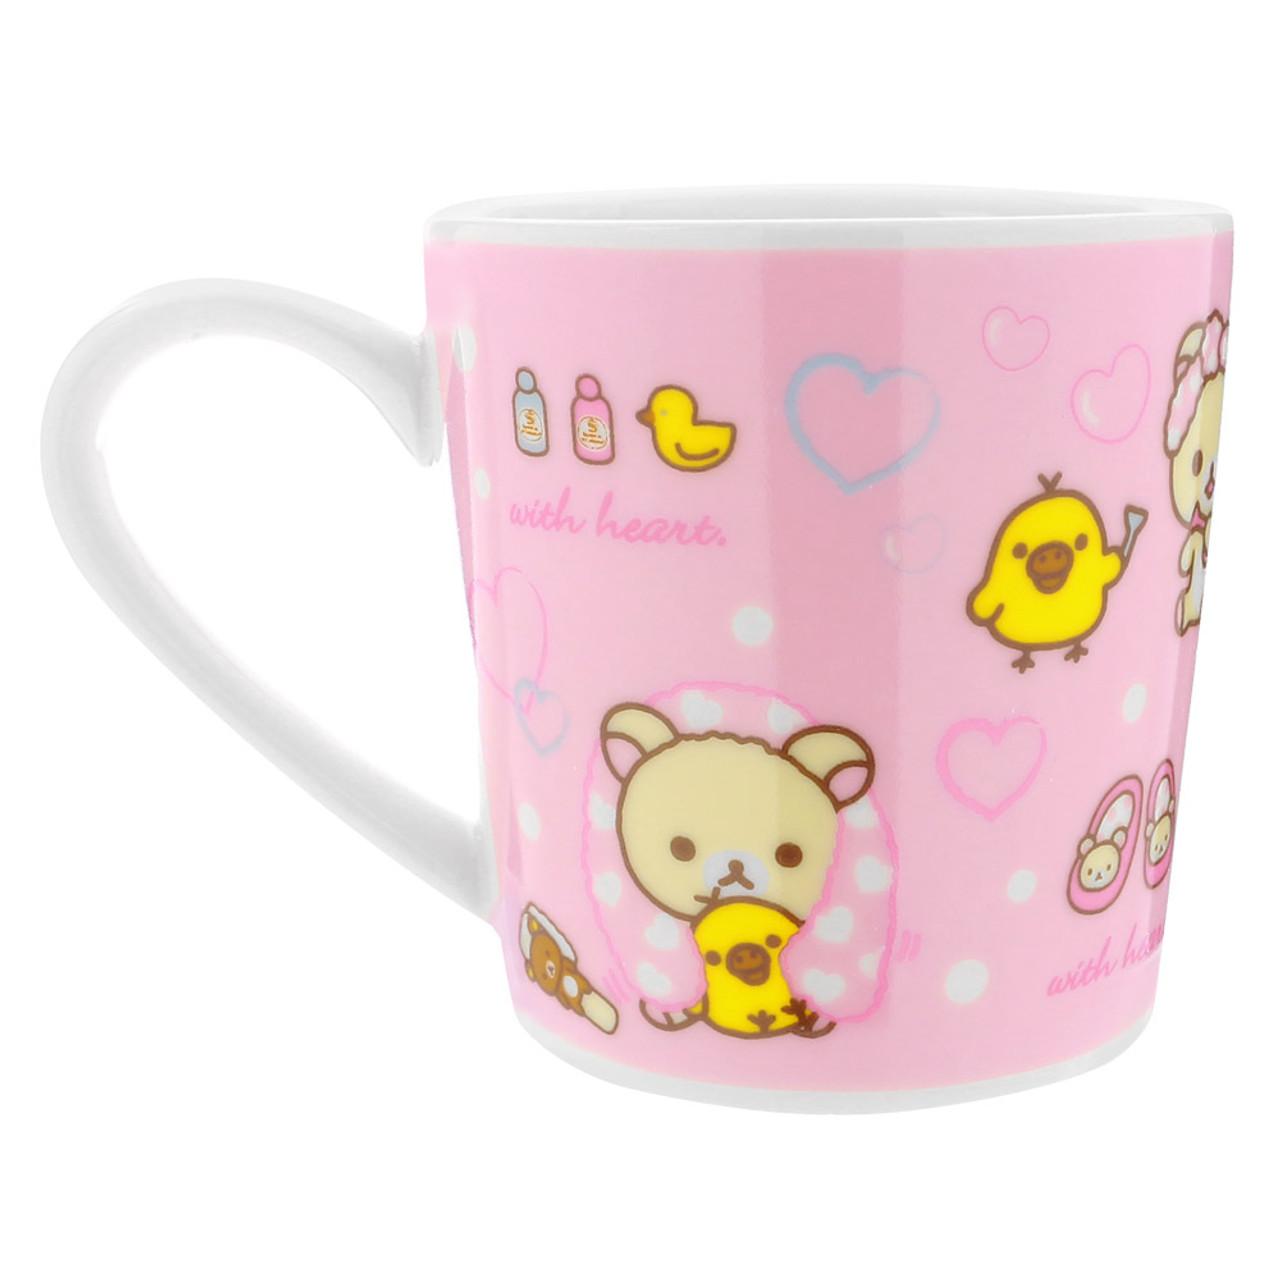 San-x Rilakkuma Bath Time Light Pink Ceramic Cup - Bubble ( Back View )